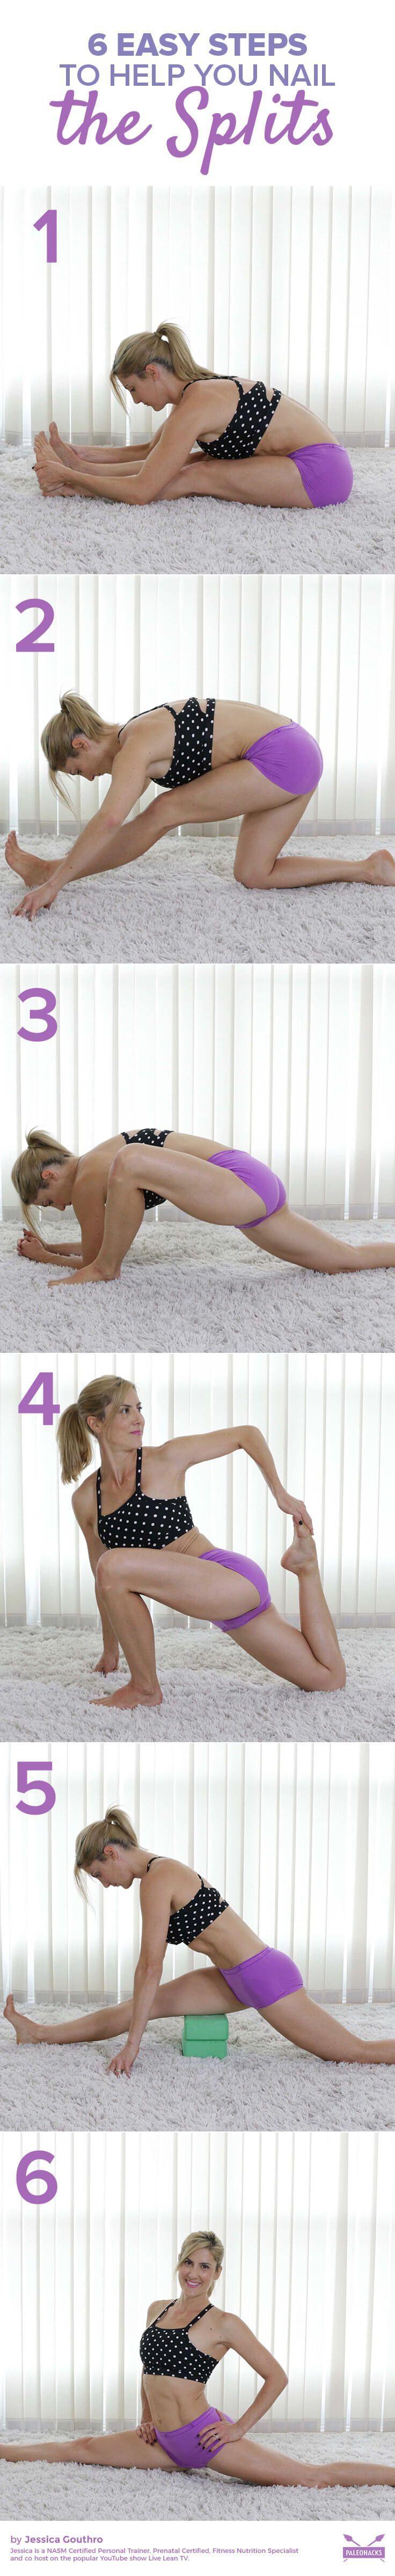 Best 25+ Yoga poses chart ideas on Pinterest | Ashtanga ...